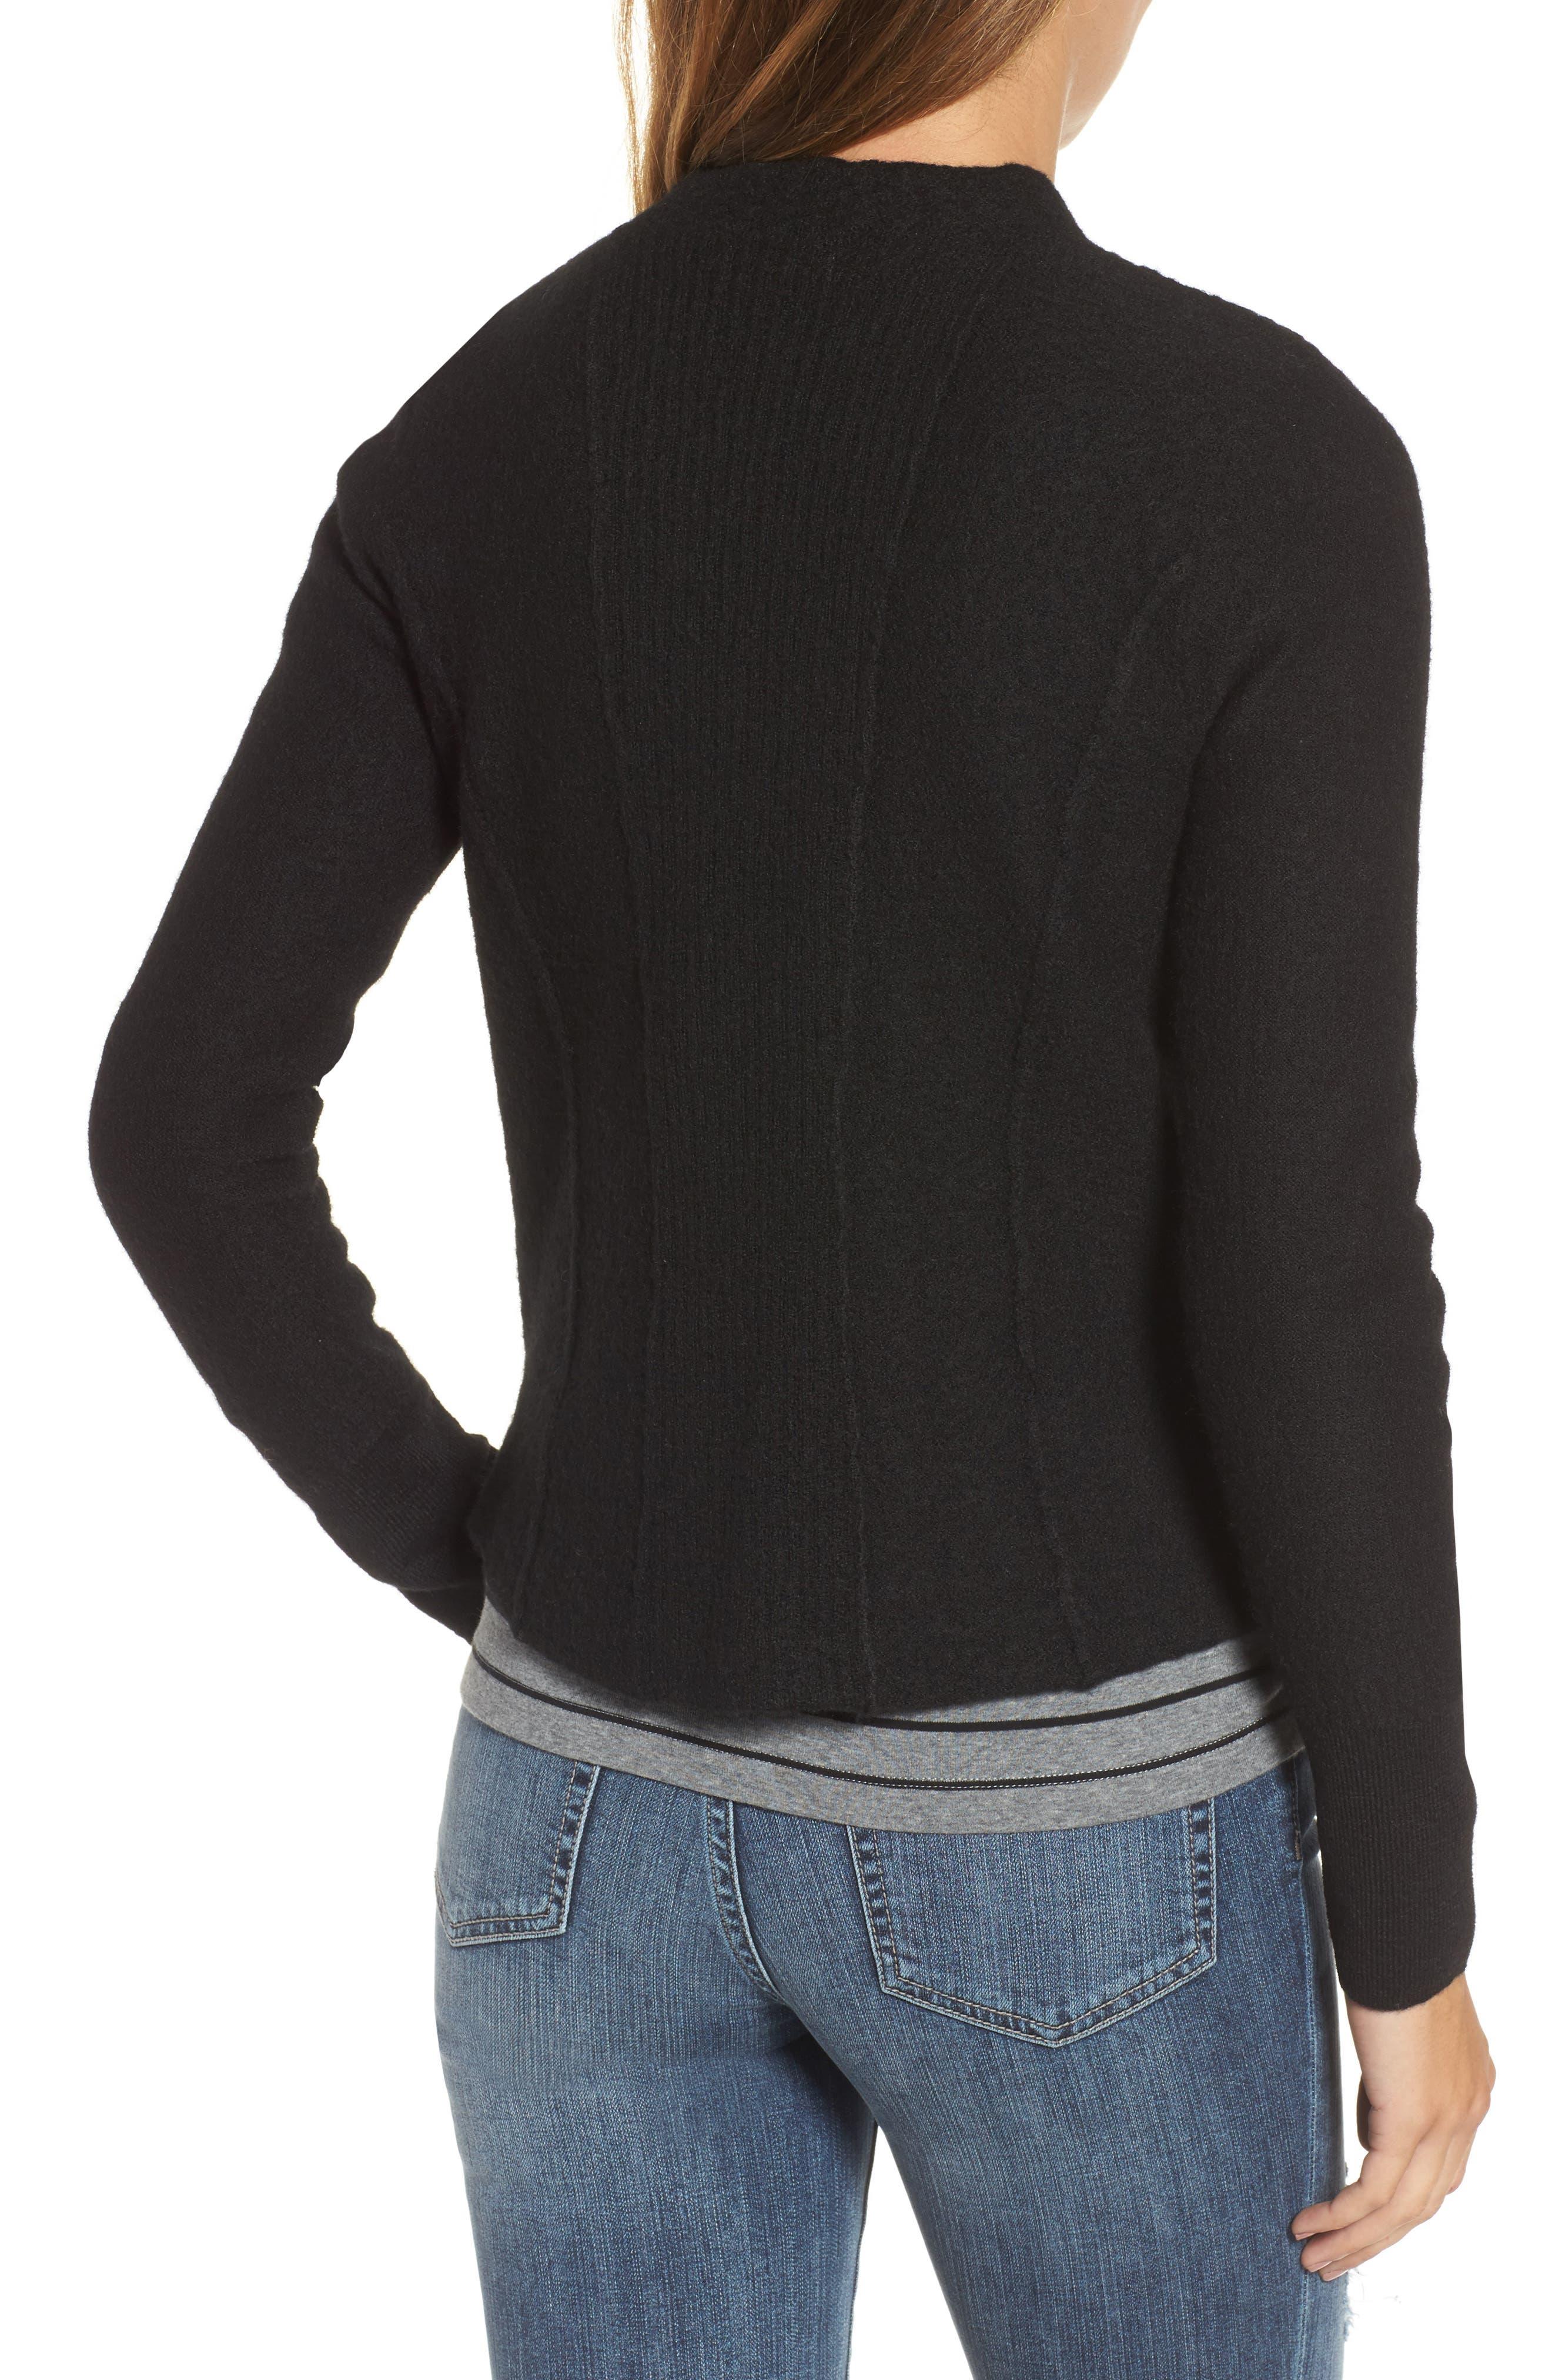 Knit Sweater Coat,                             Alternate thumbnail 2, color,                             001